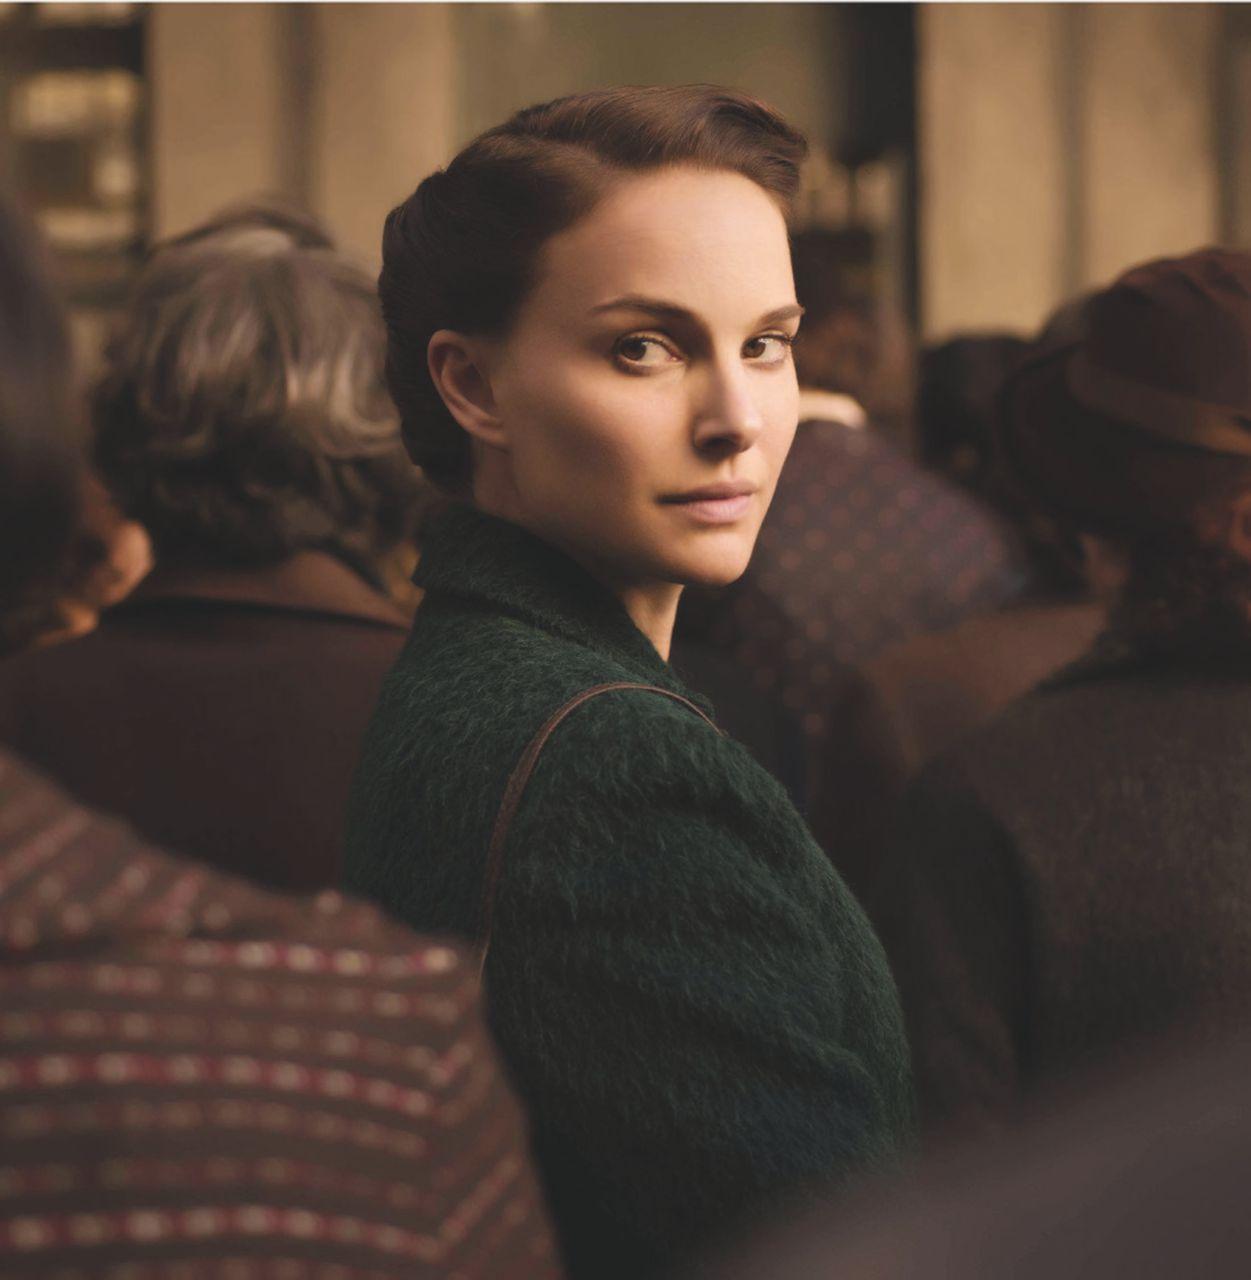 La Gerusalemme oscurata e sterile di Natalie Portman